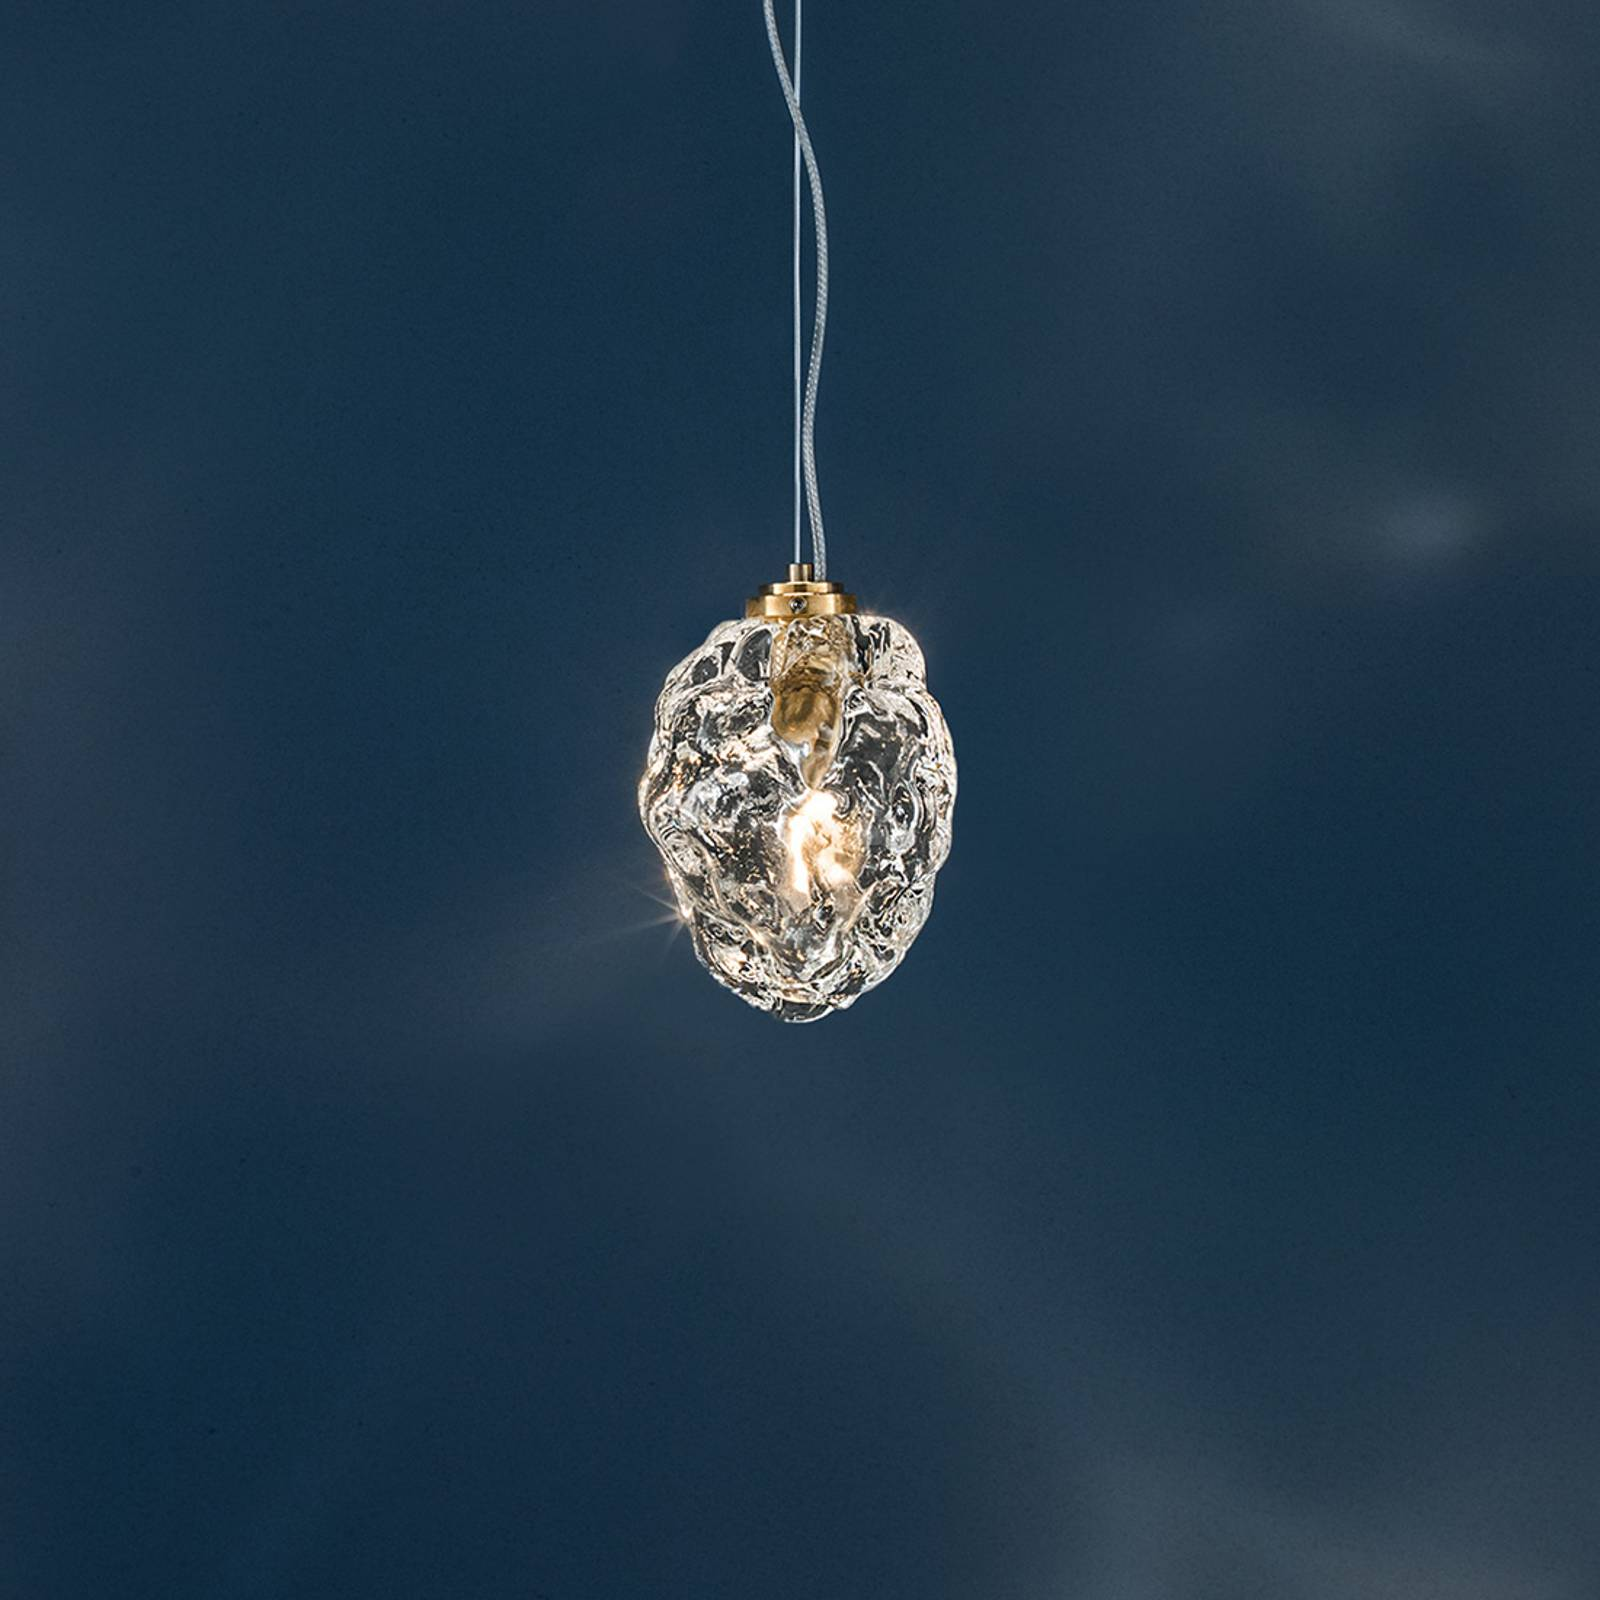 Catellani & Smith More Hängeleuchte LED klar